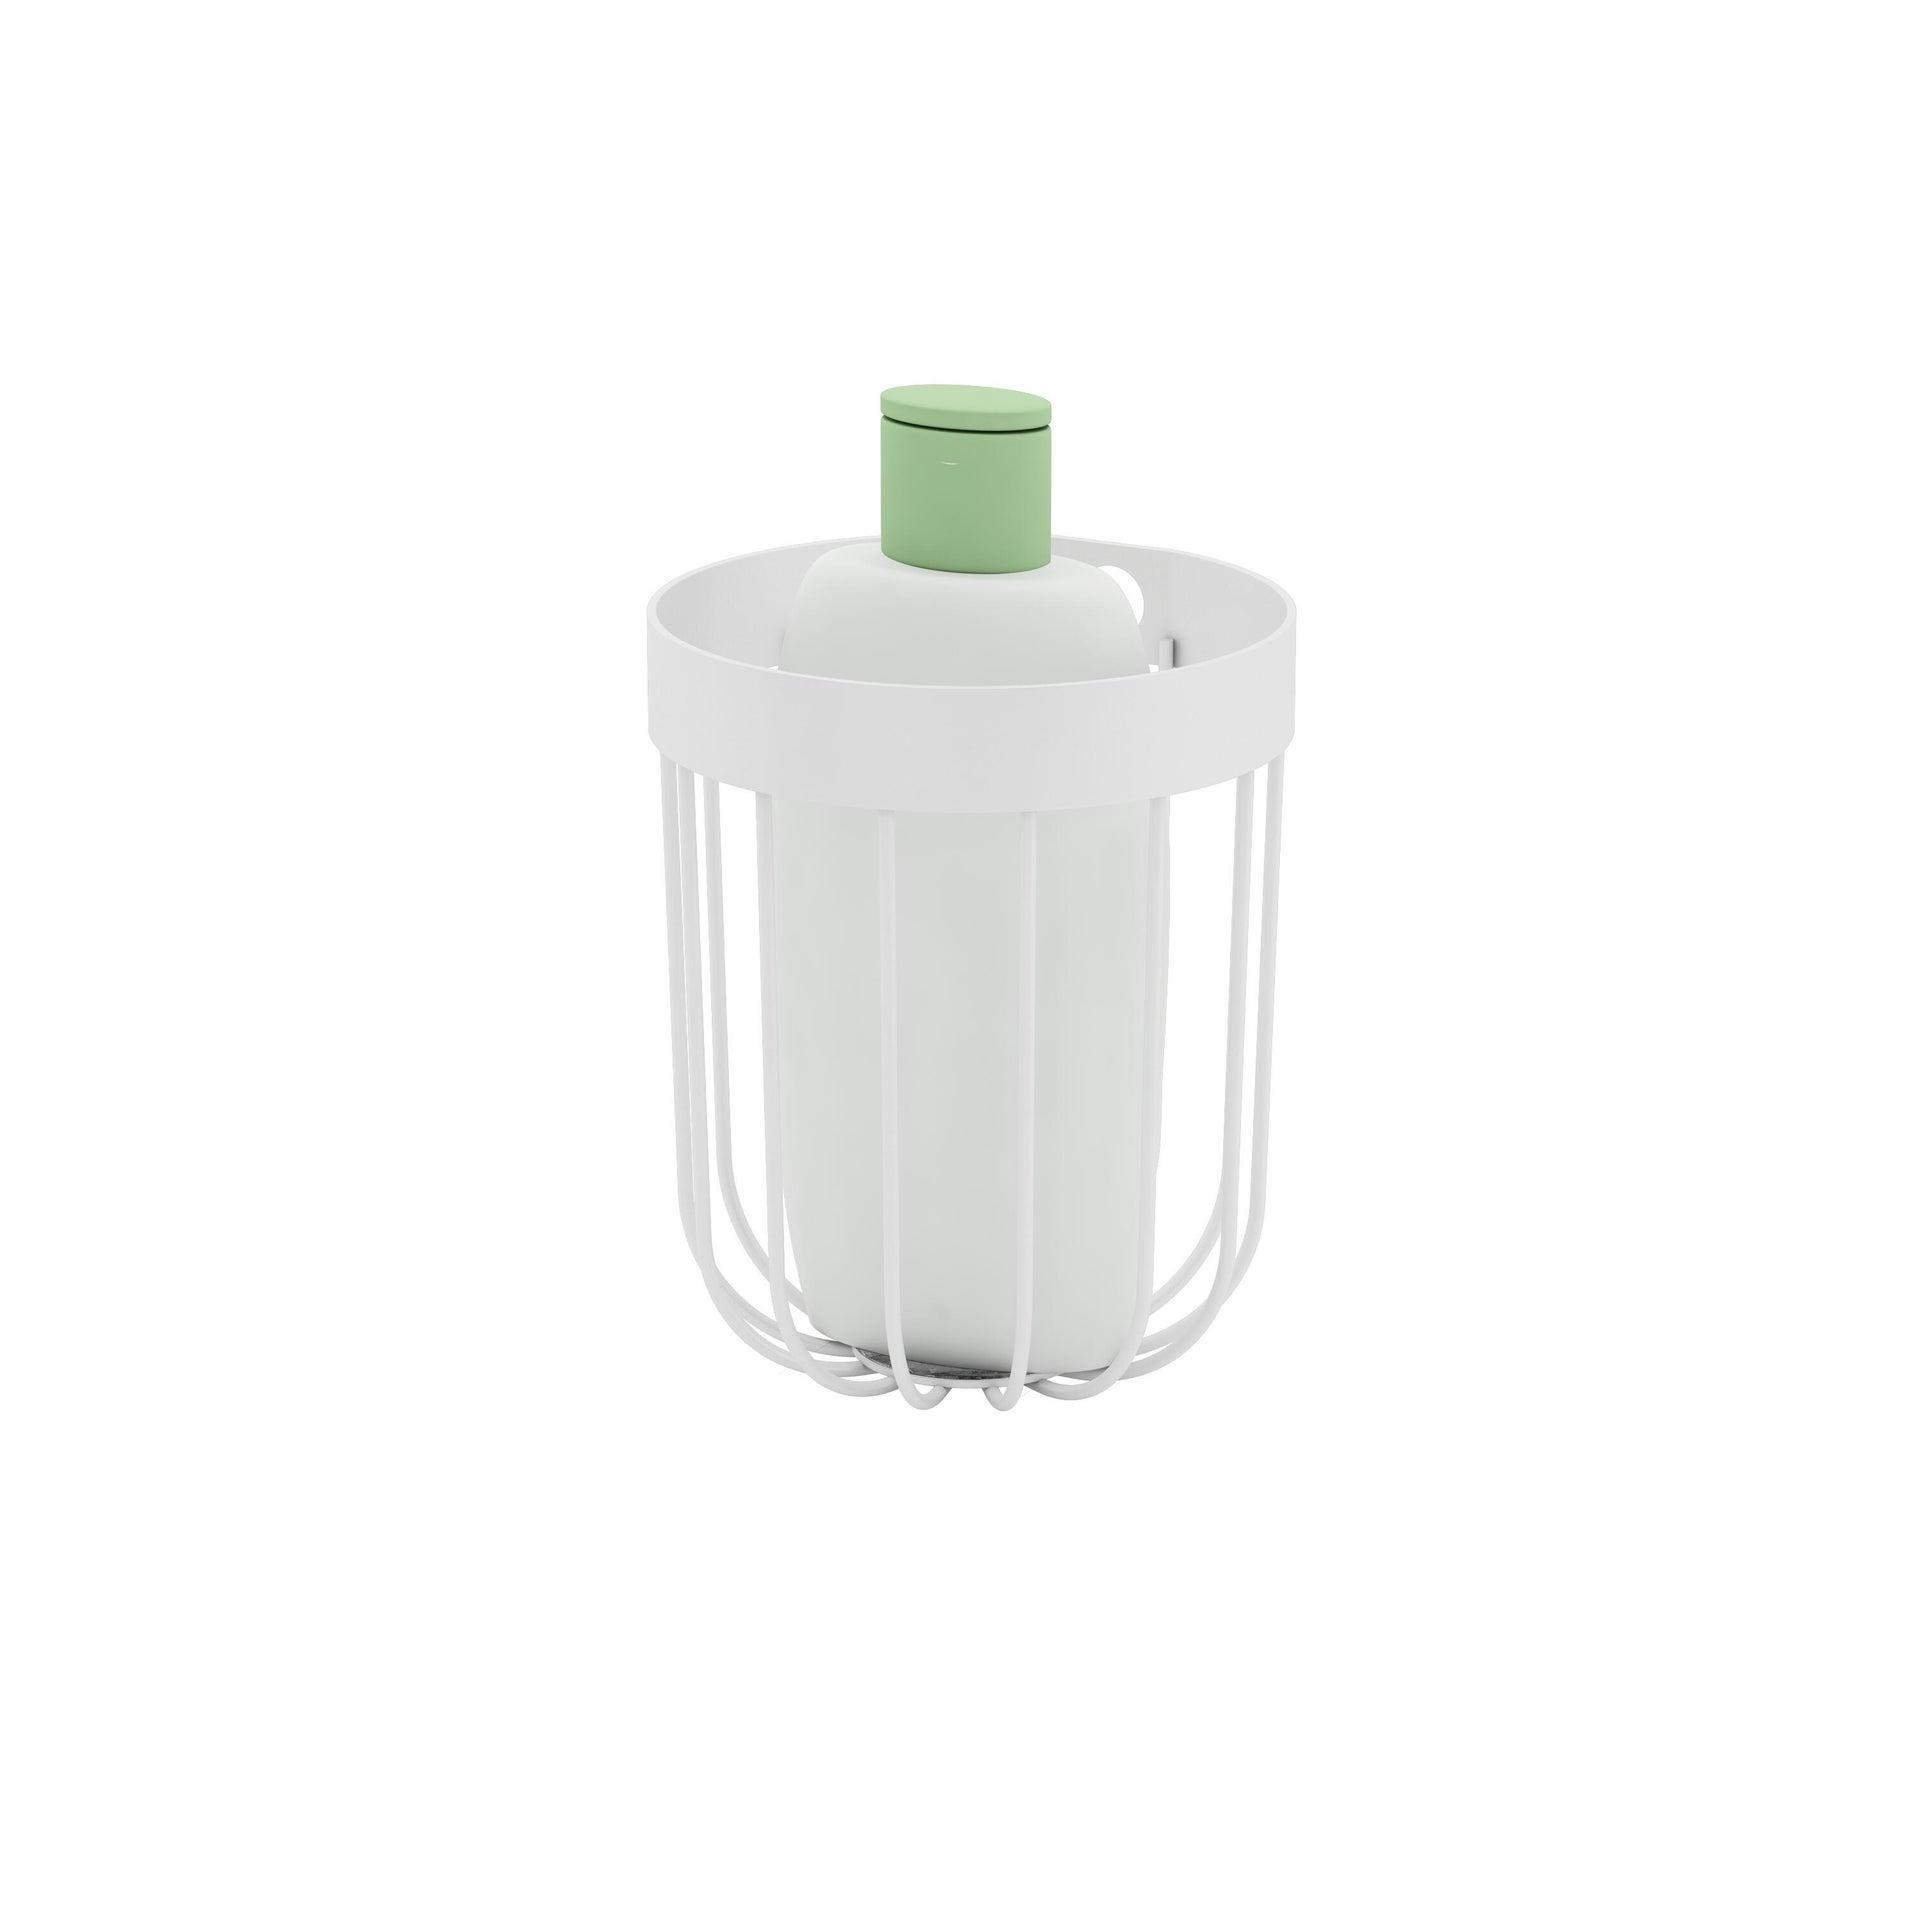 Vassoio doccia Neo 1 ripiano bianco - 2